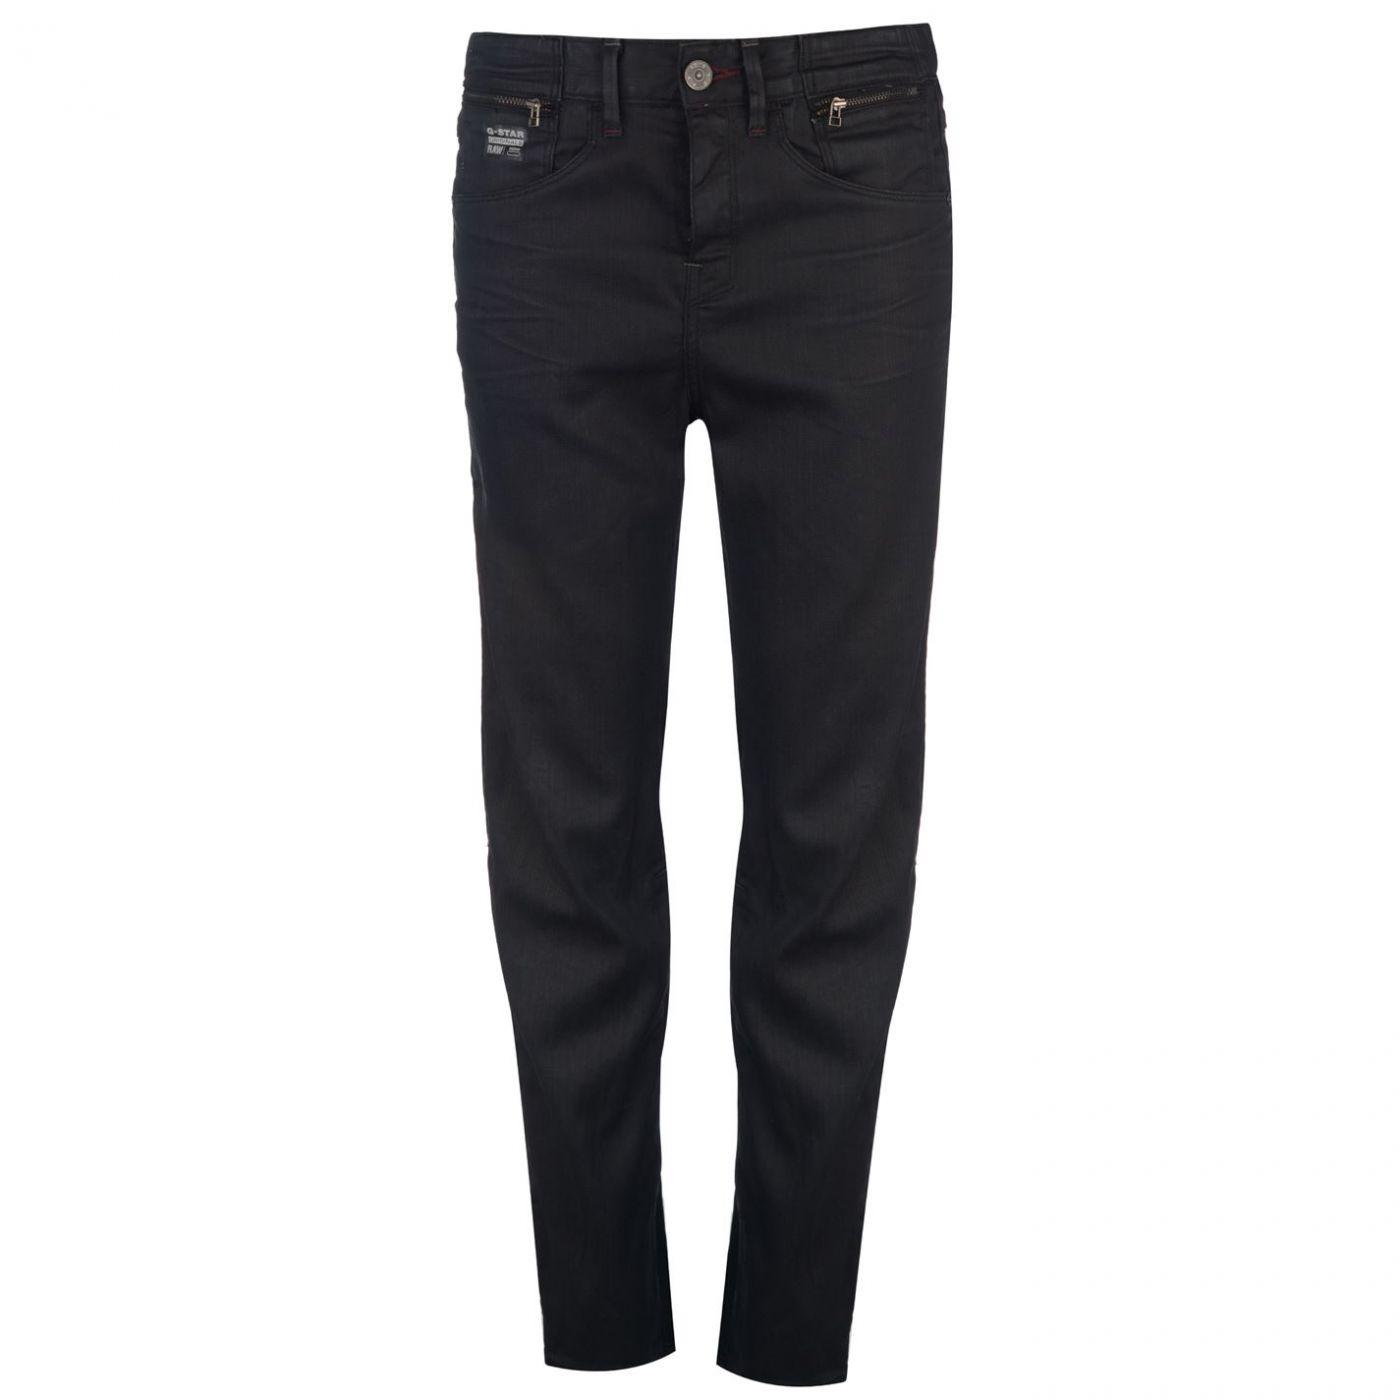 G Star 60265 Jeans